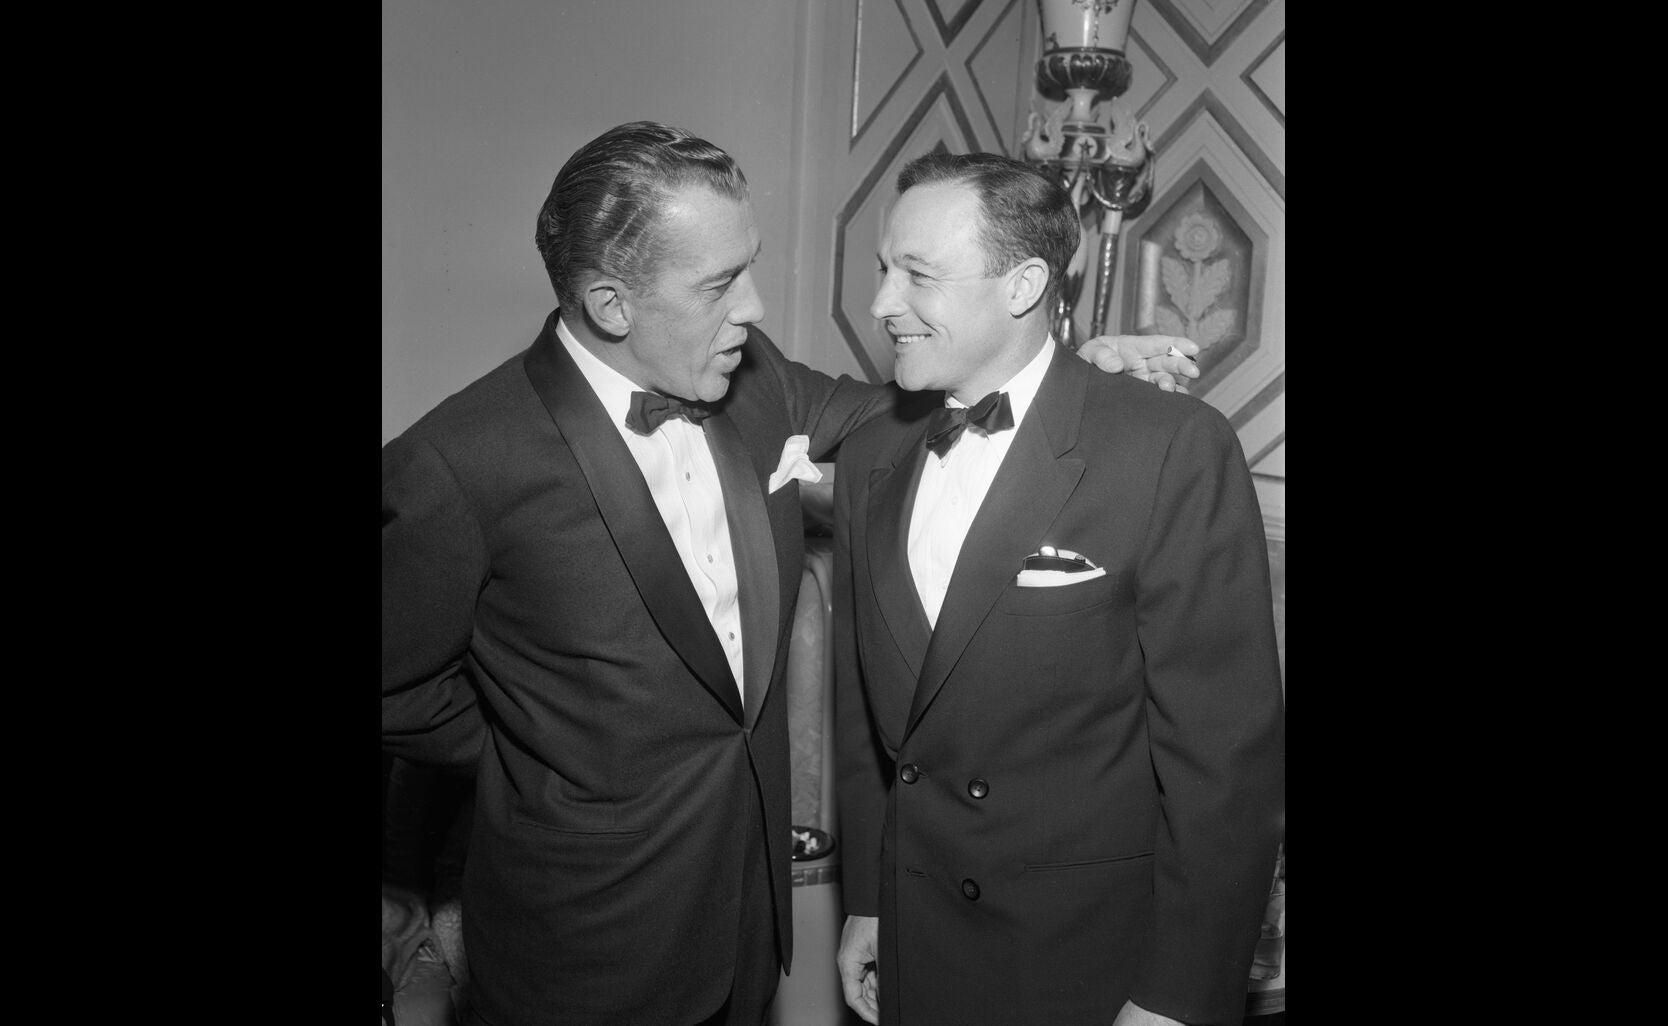 Ed Sullivan and Gene Kelly at the 1959 Golden Globe Awards